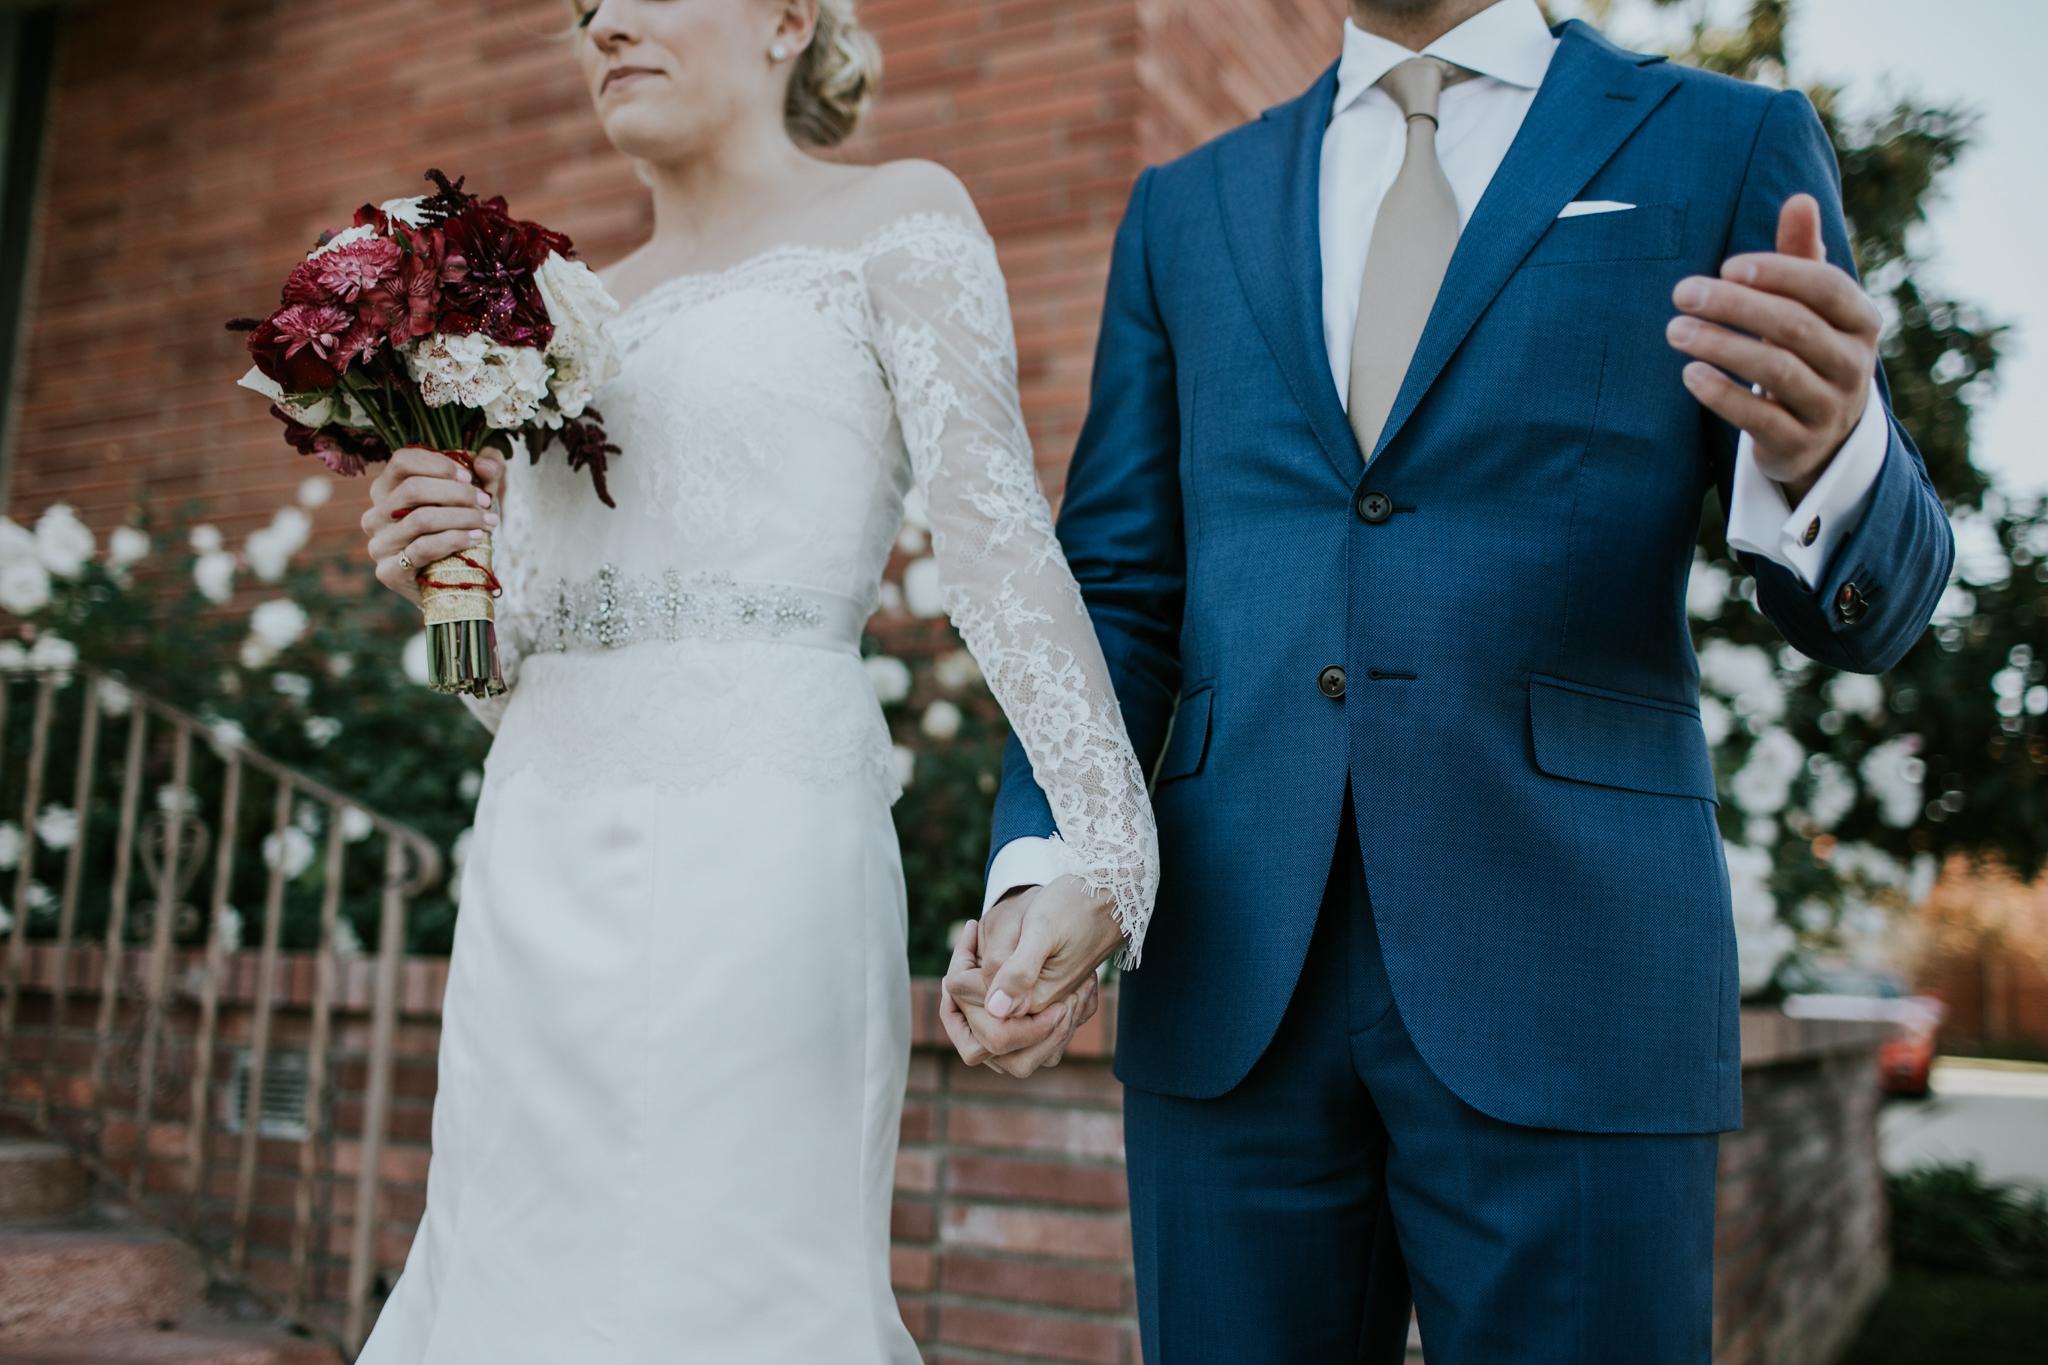 20151230_hussem_wedding_0252_web.jpg